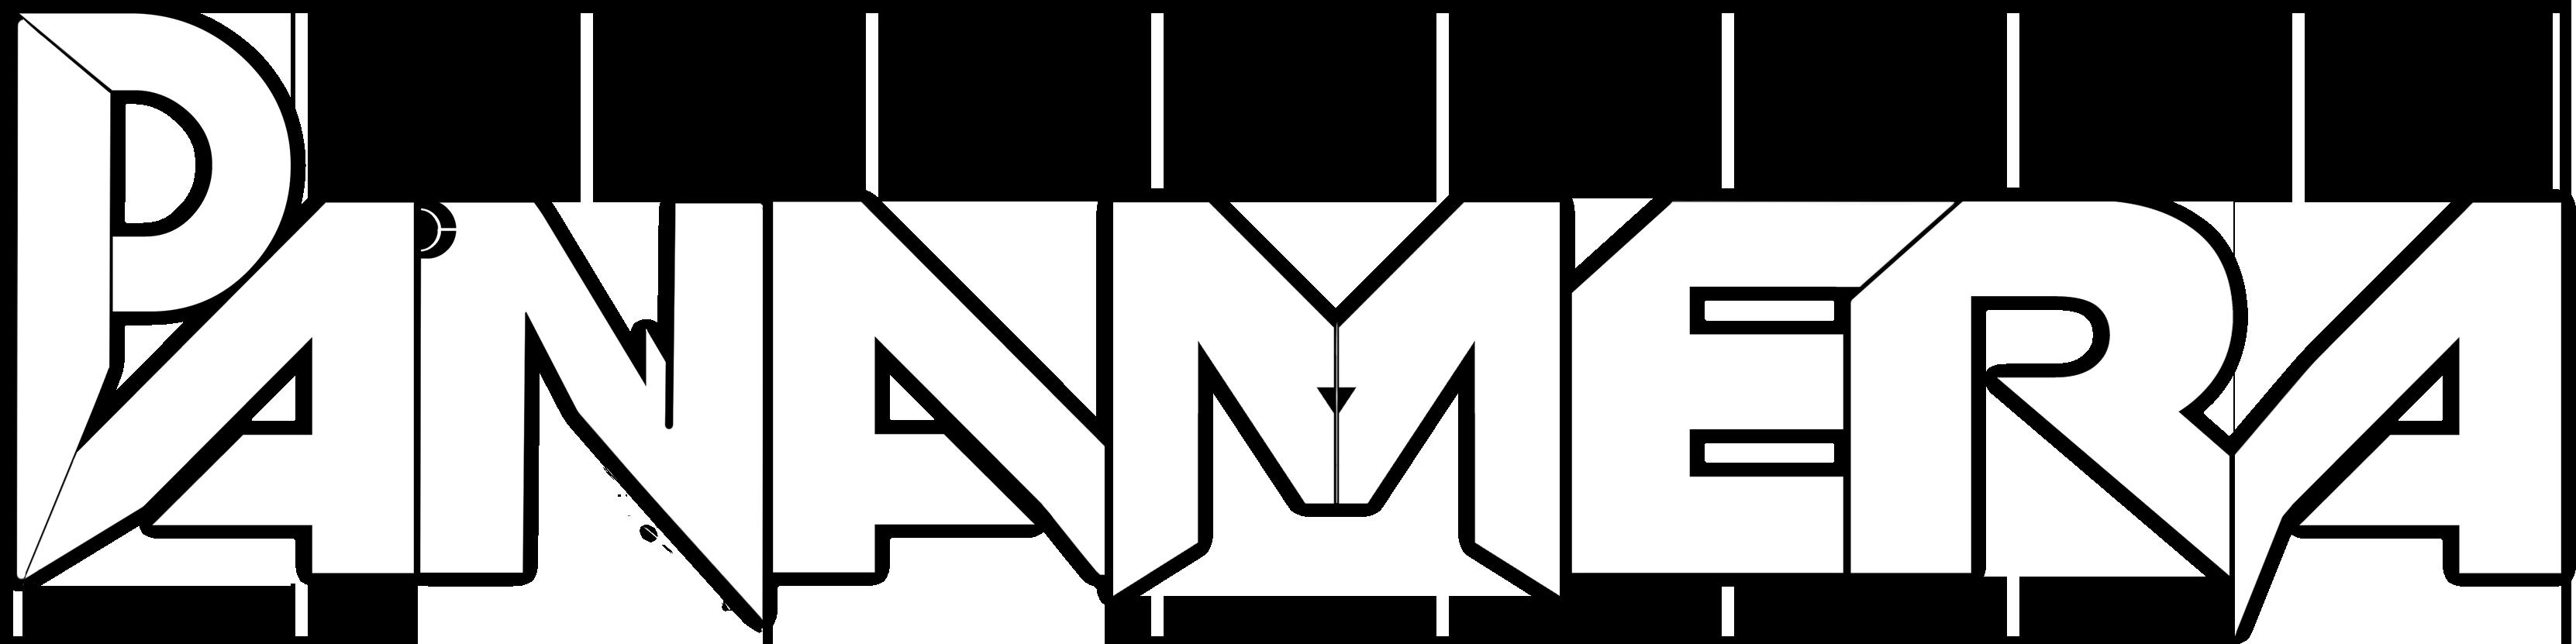 Panamera New Logo Design By Aviram Dayan